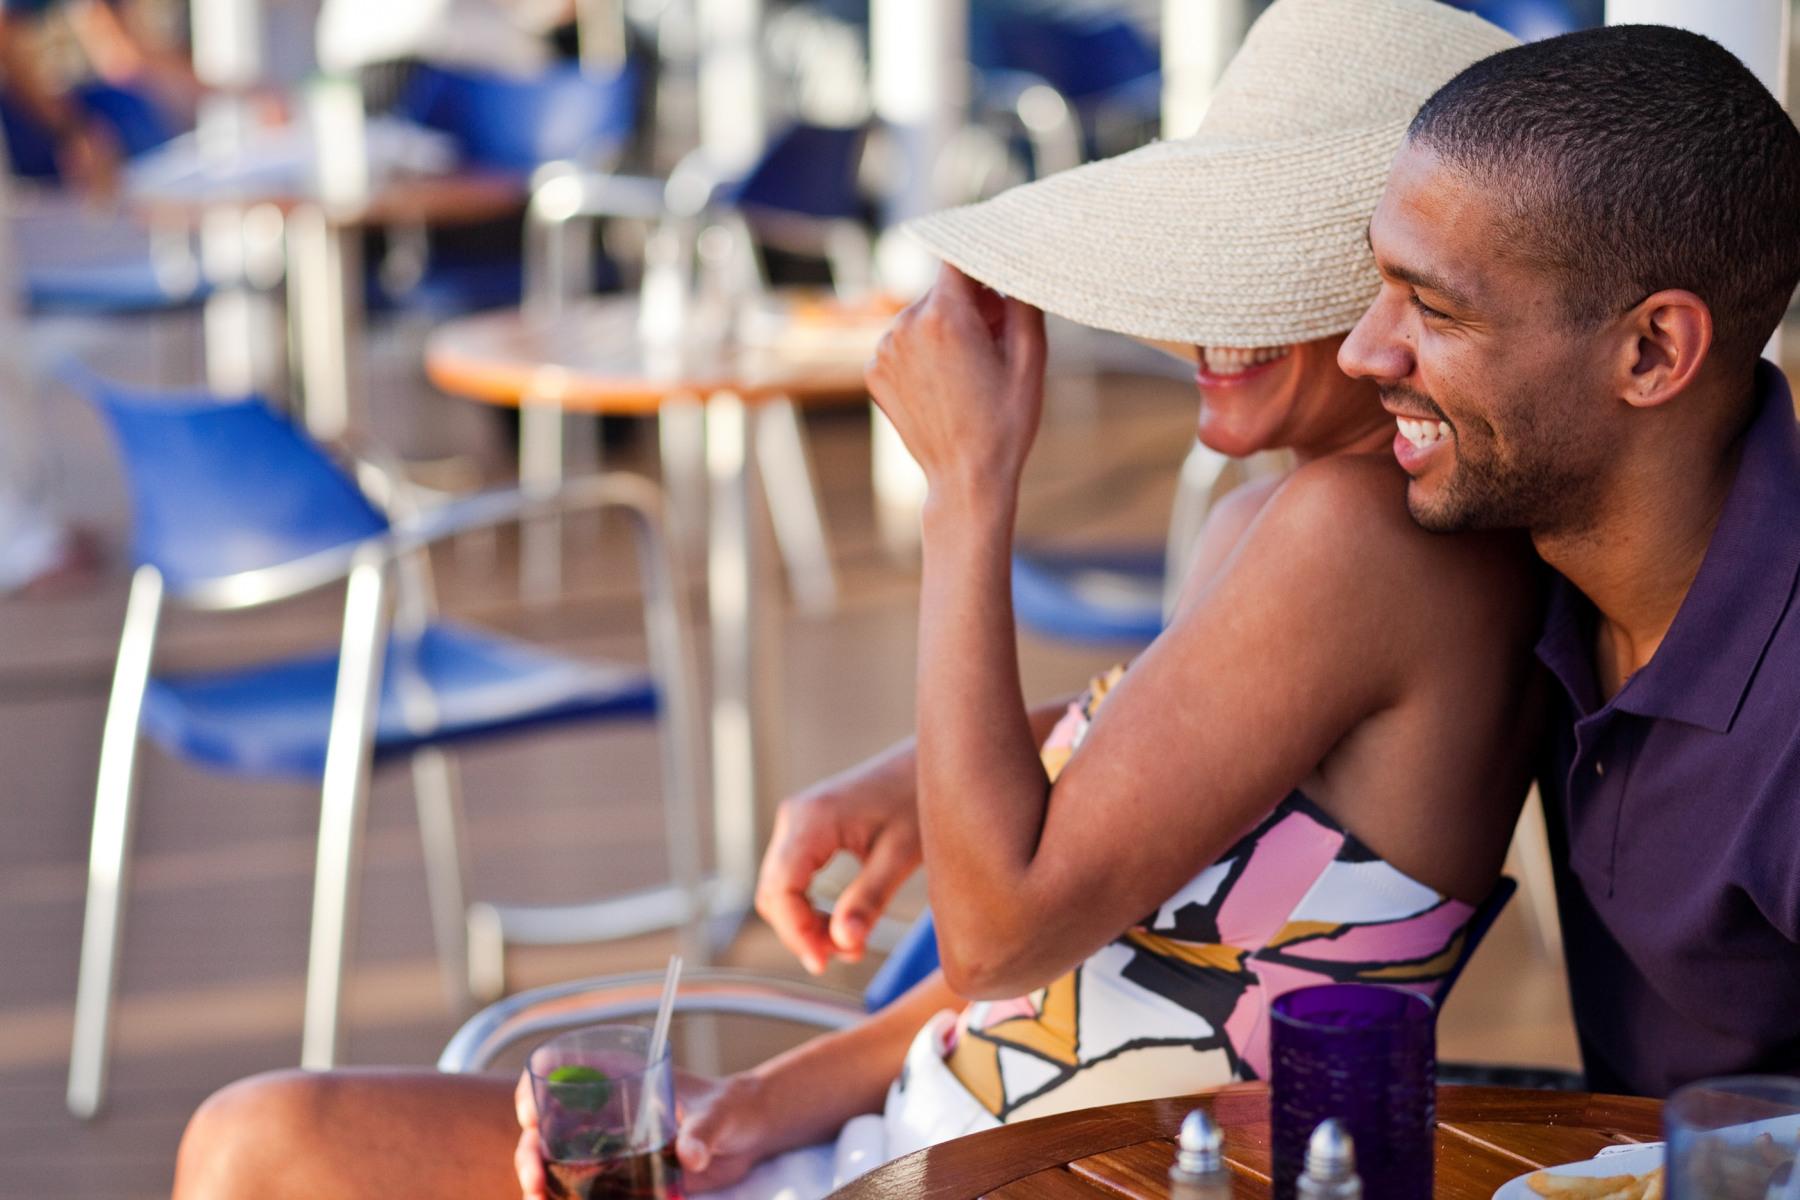 celebrity cruises celebrity eclipse mast bar grill.jpg